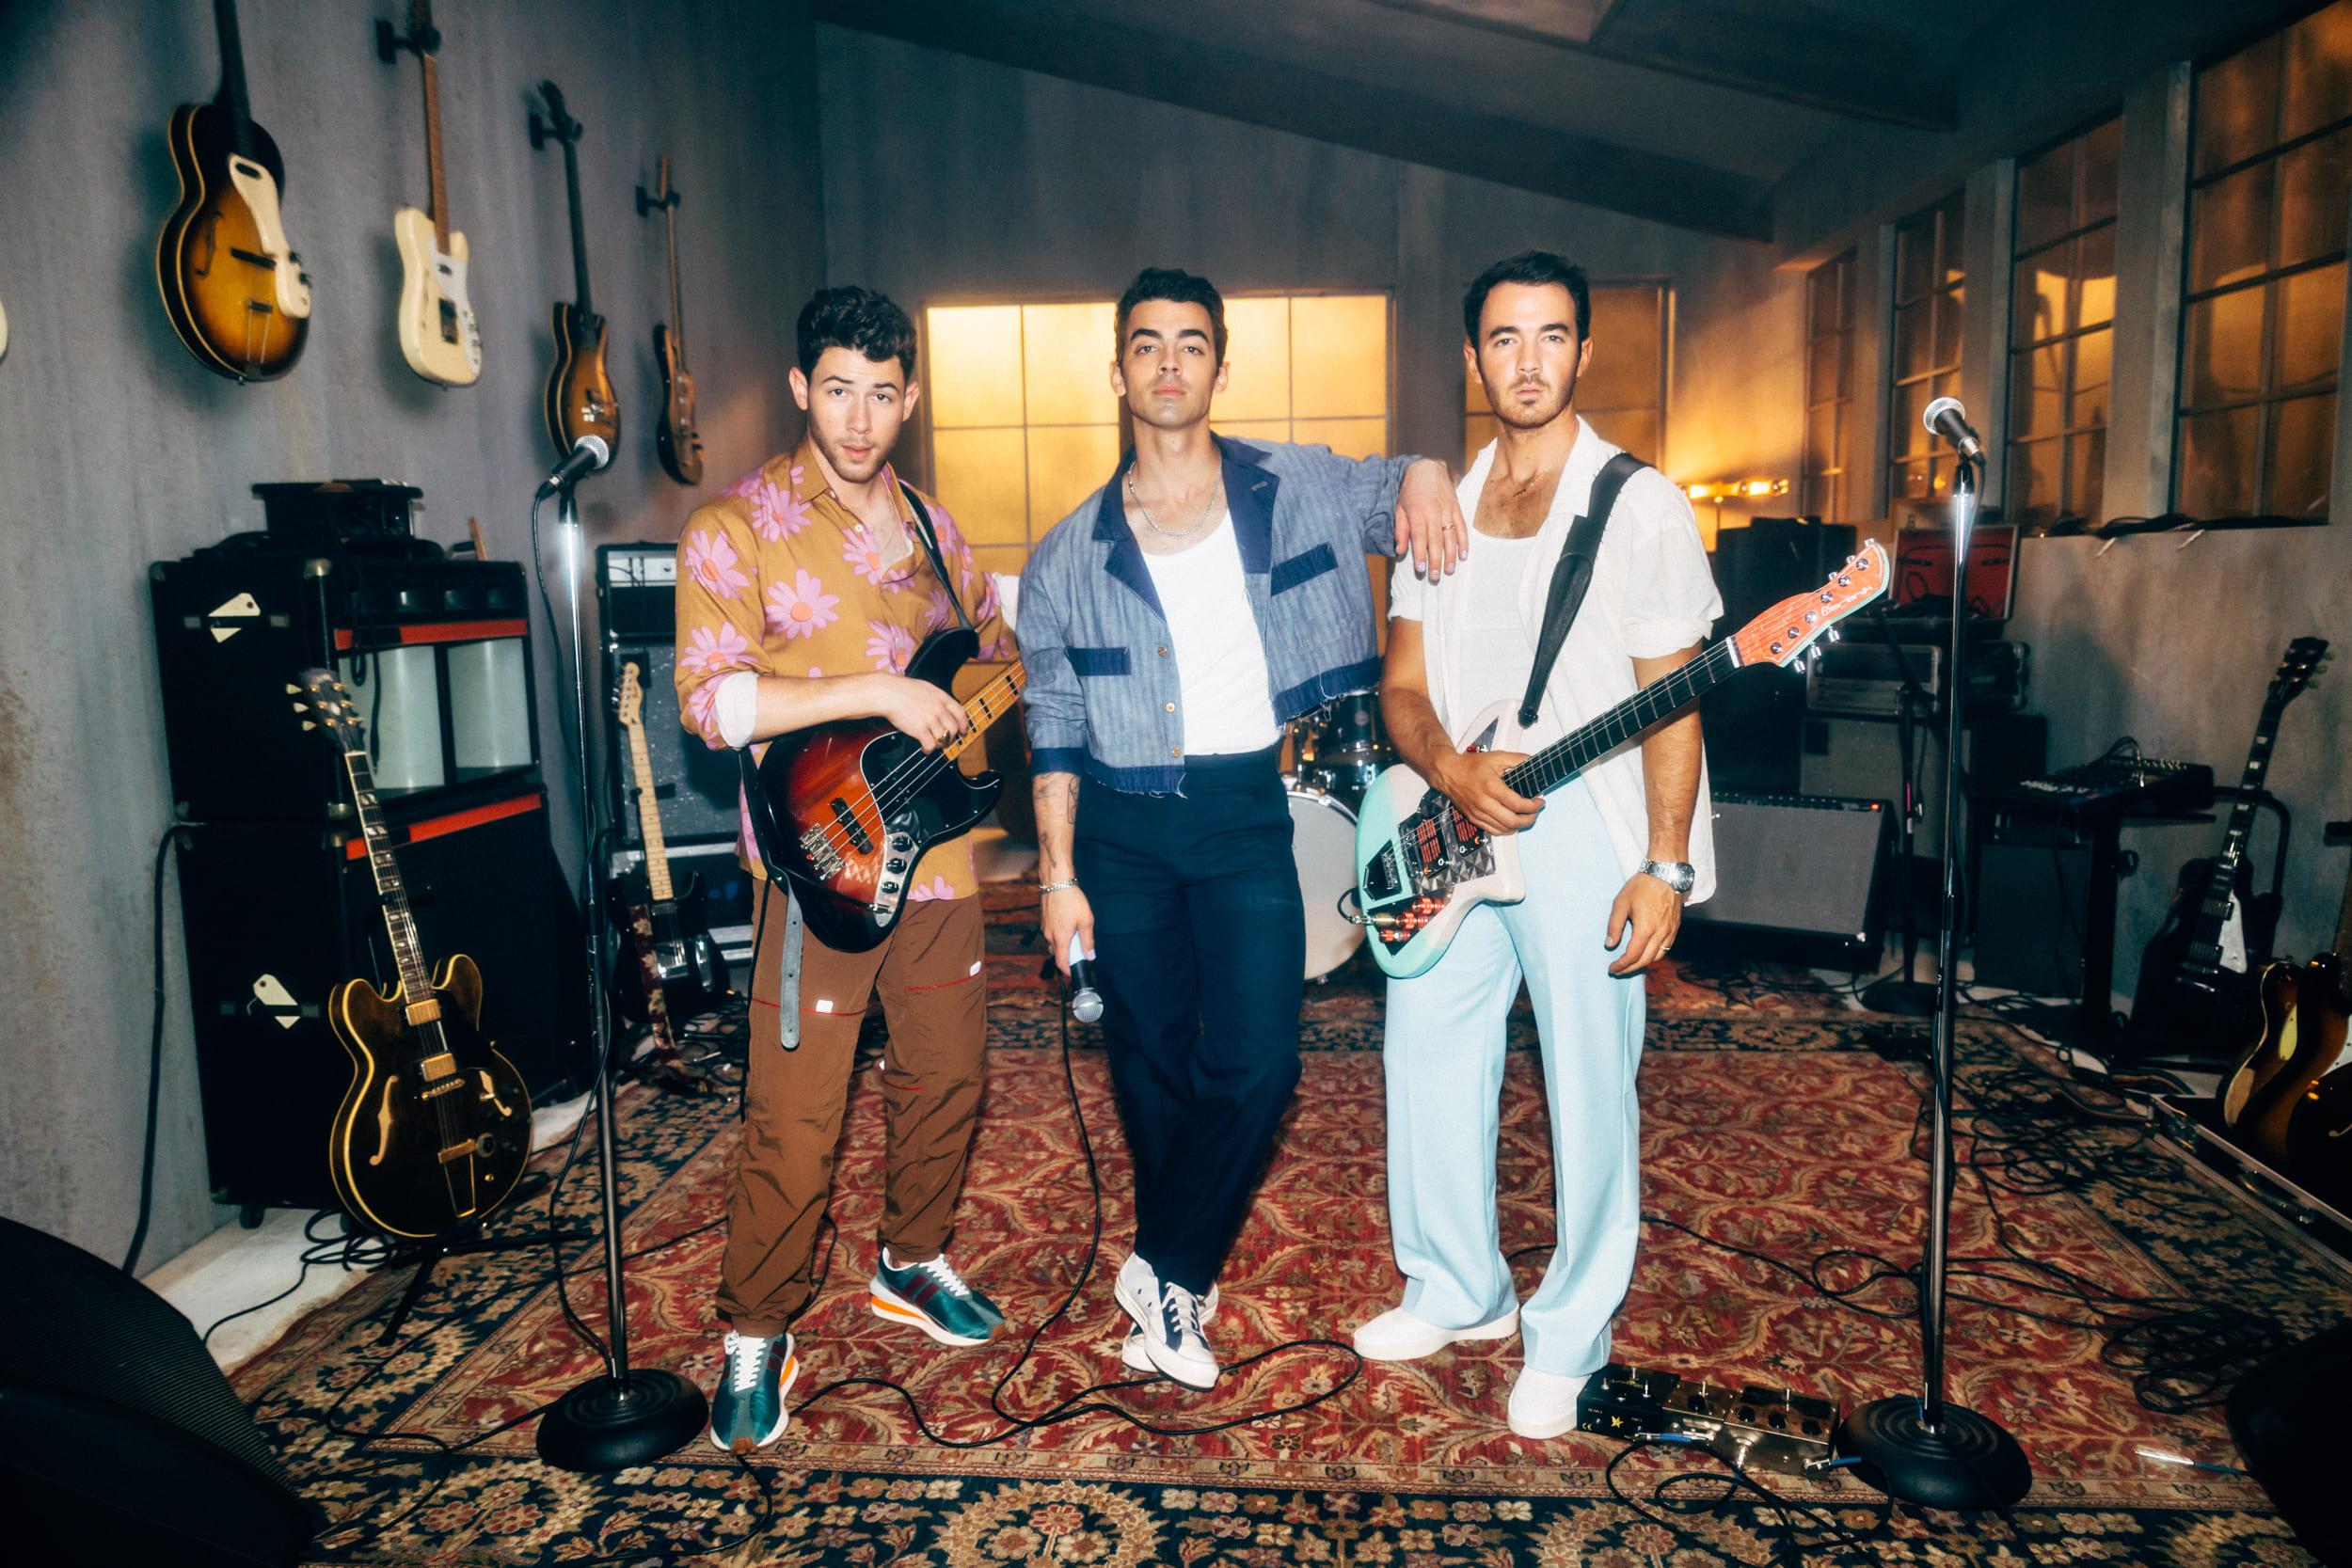 Jonas Brothers album e tour - immagini